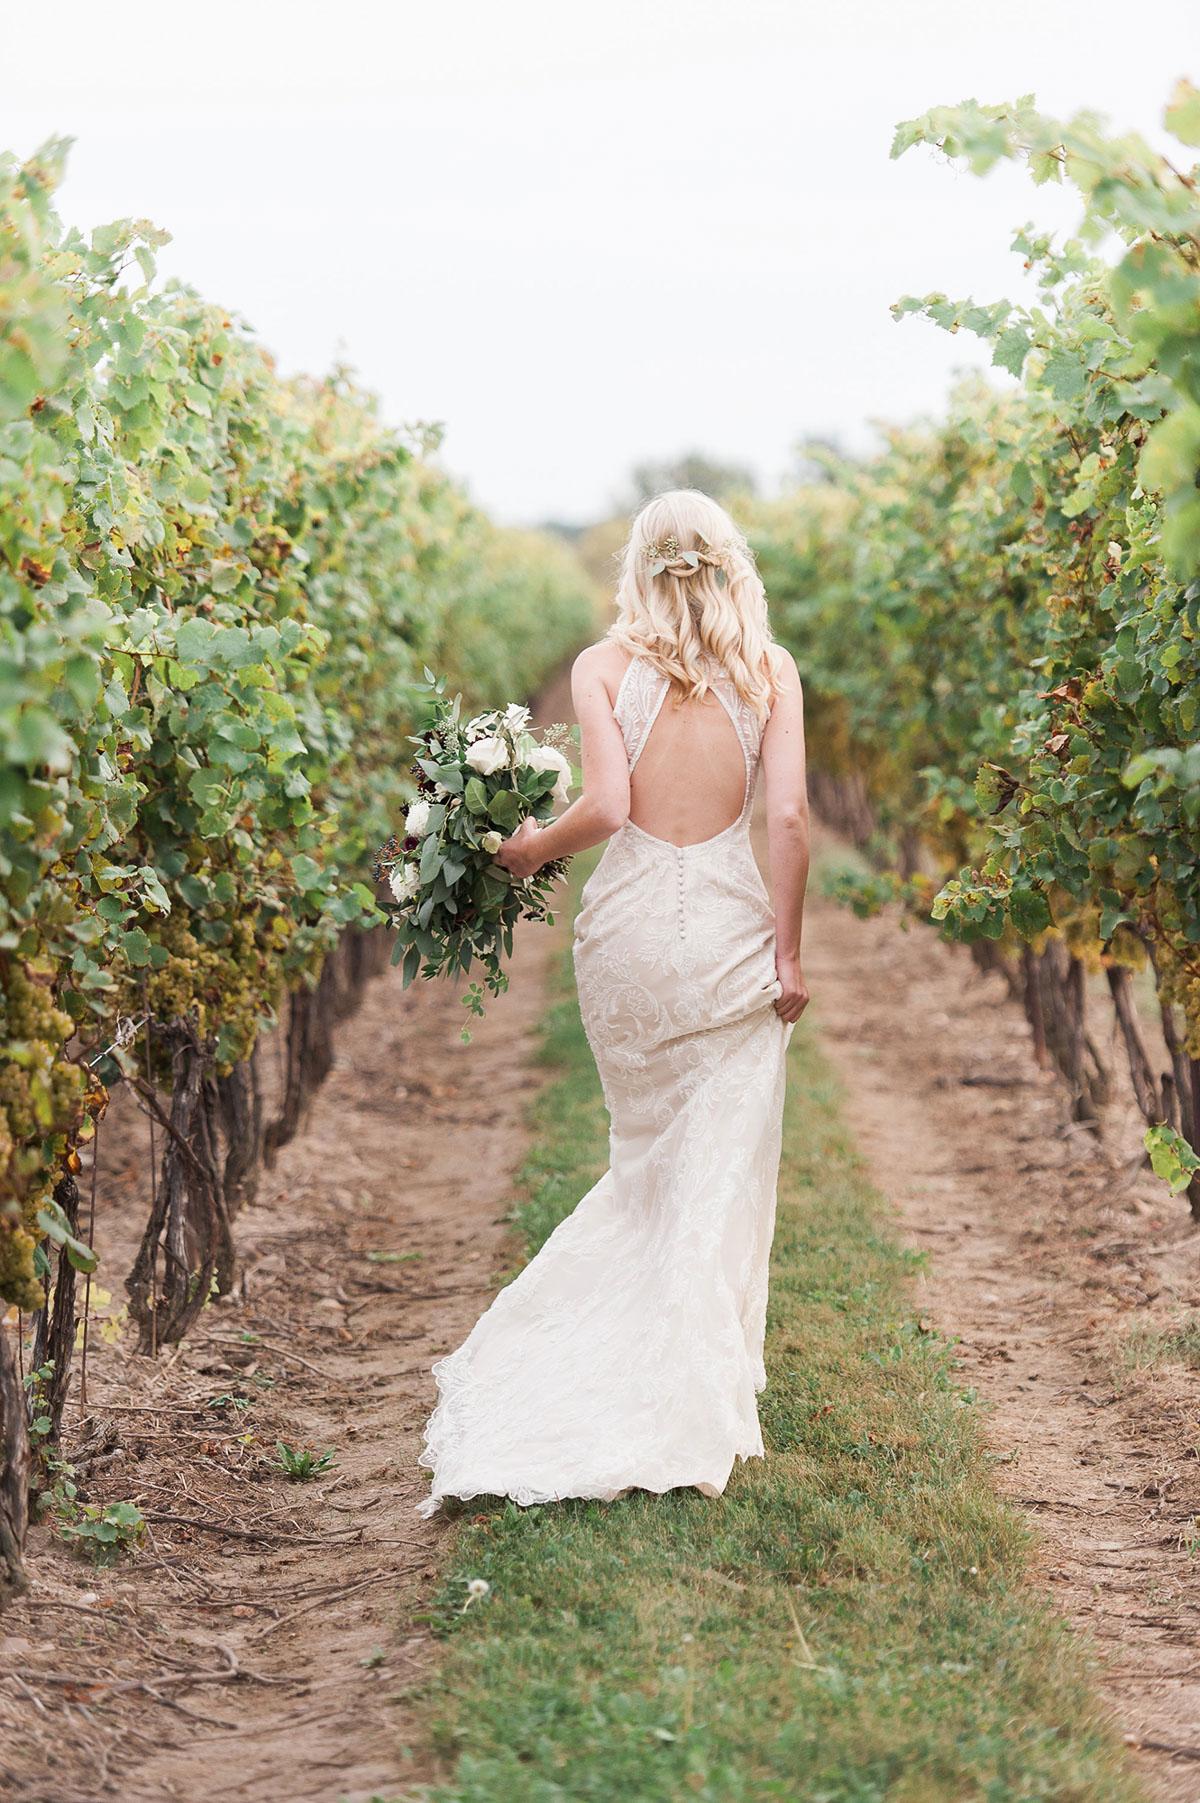 gemini-photography-vineyard-bride-swish-list-honsberger-estates-jordan-wedding-35.jpg